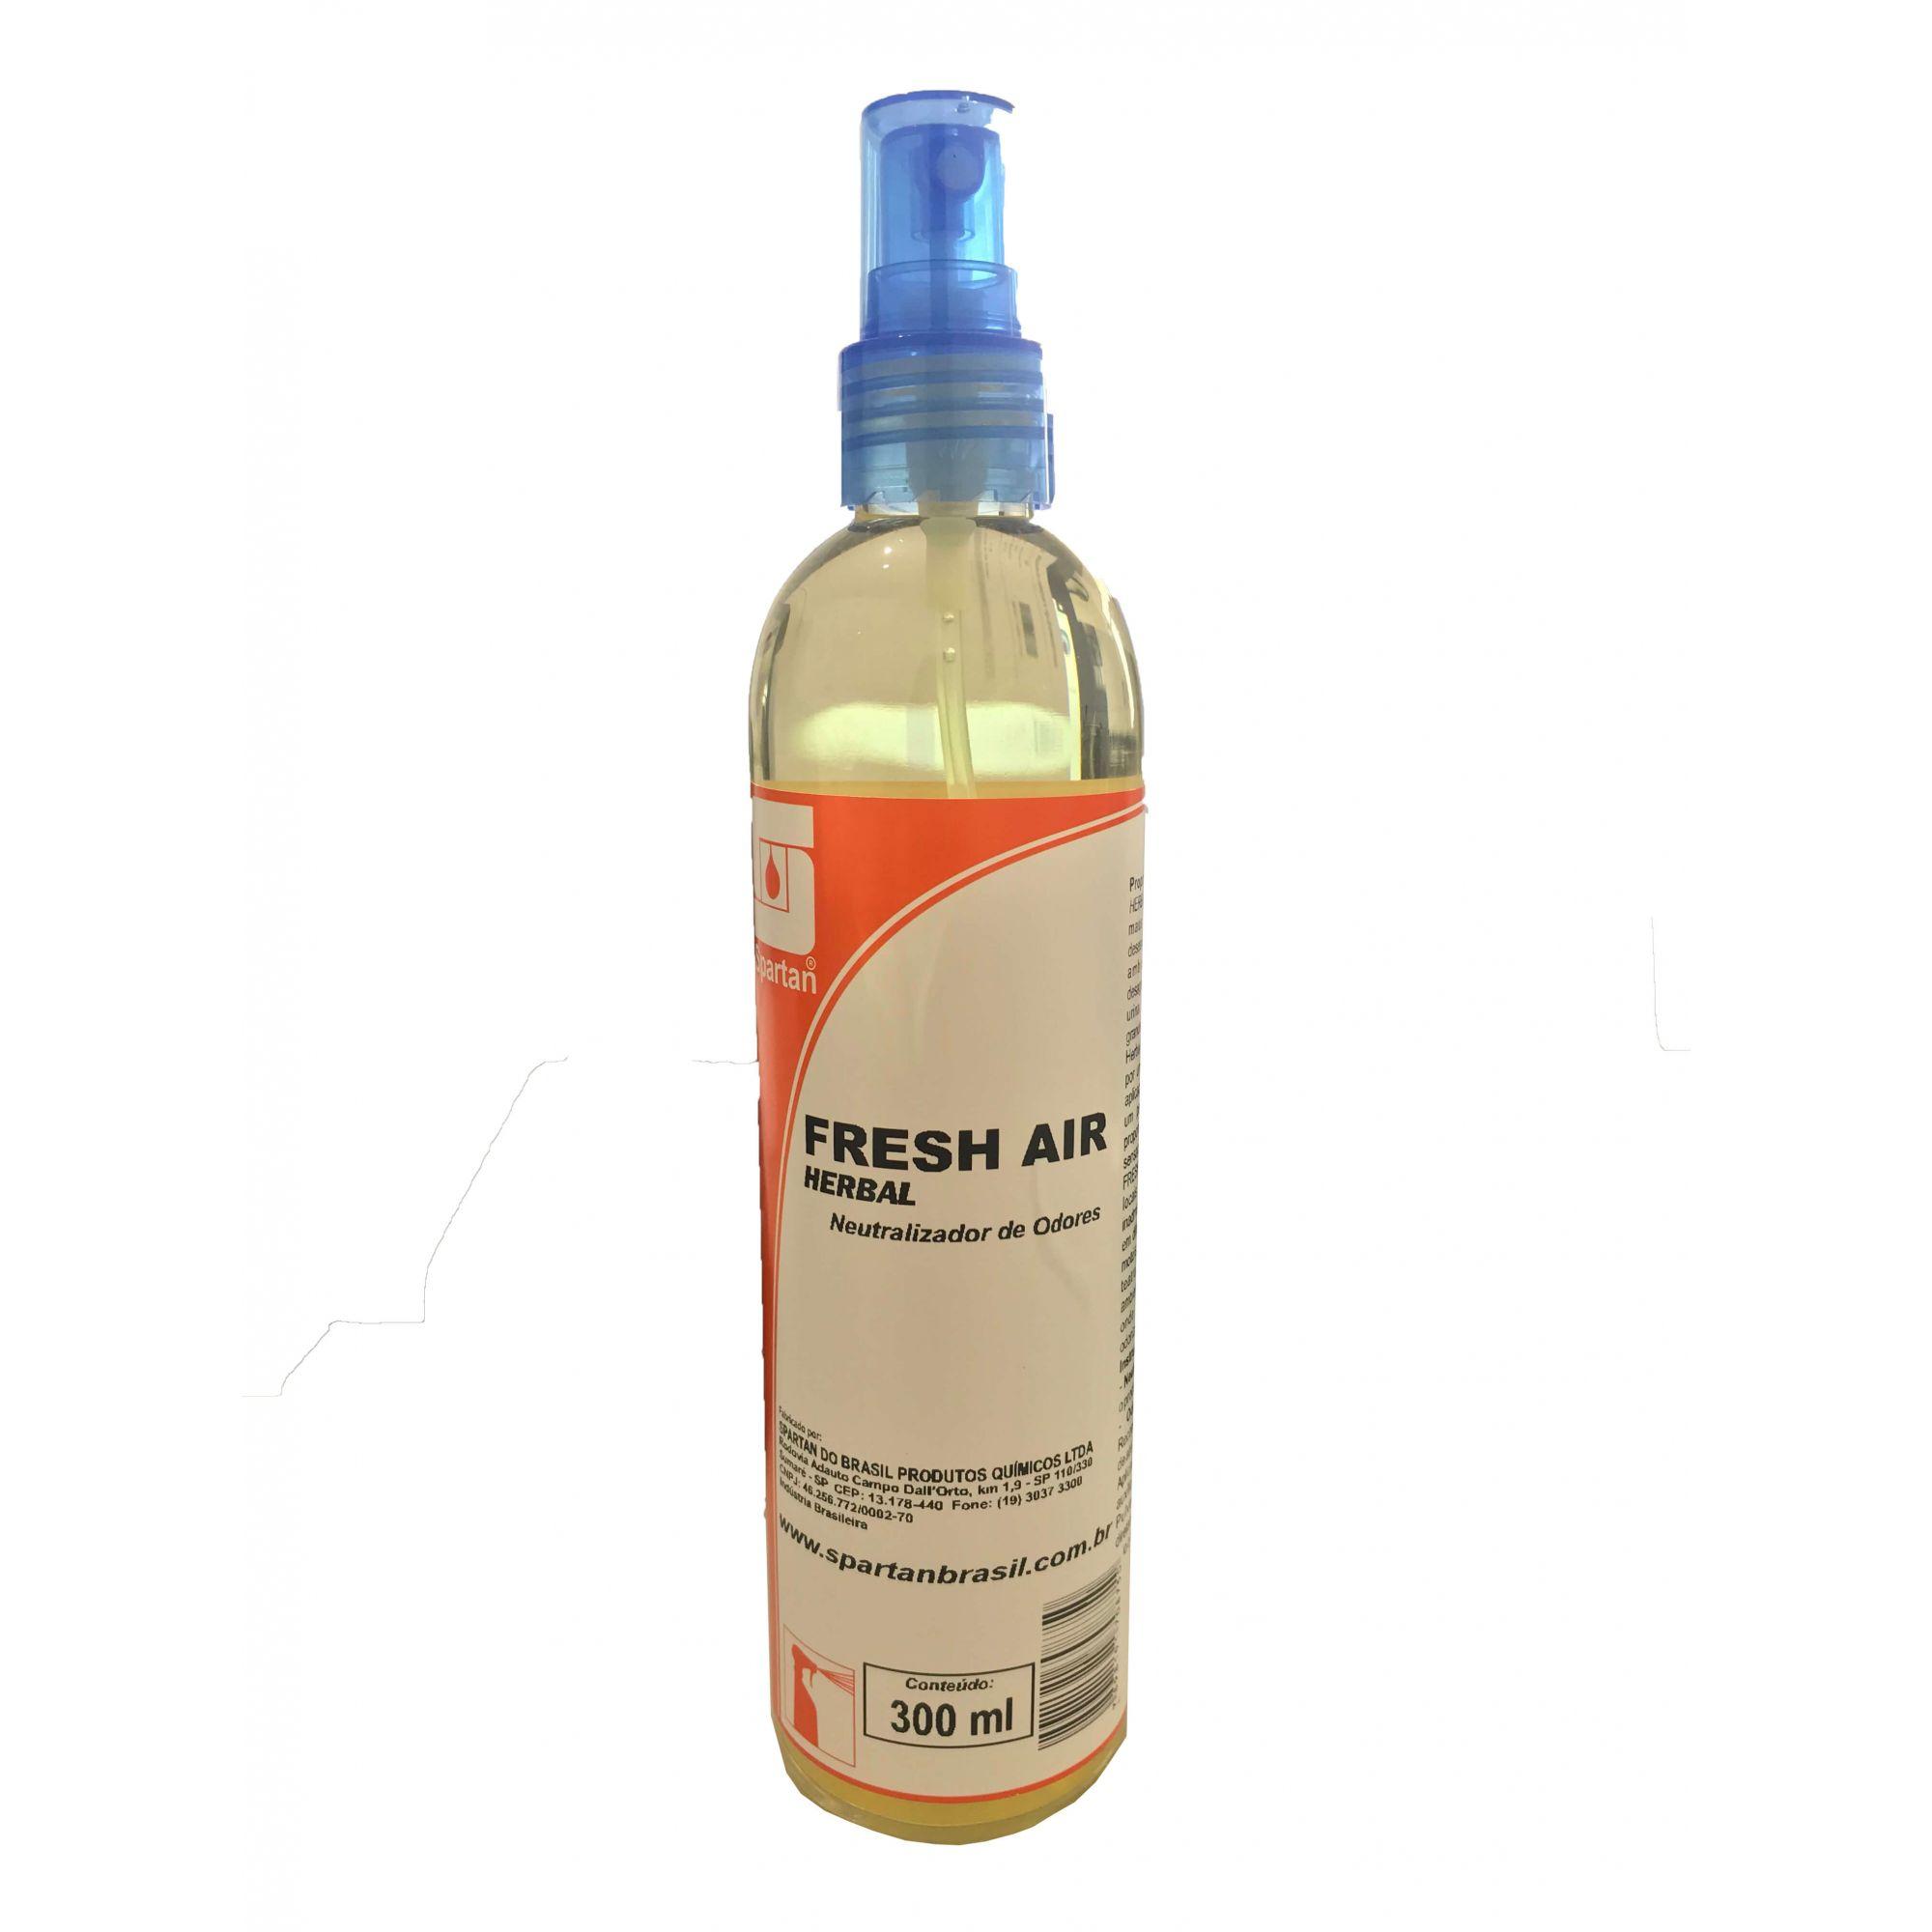 Neutralizador de Odores Fresh Air Herbal 300 ml Spartan